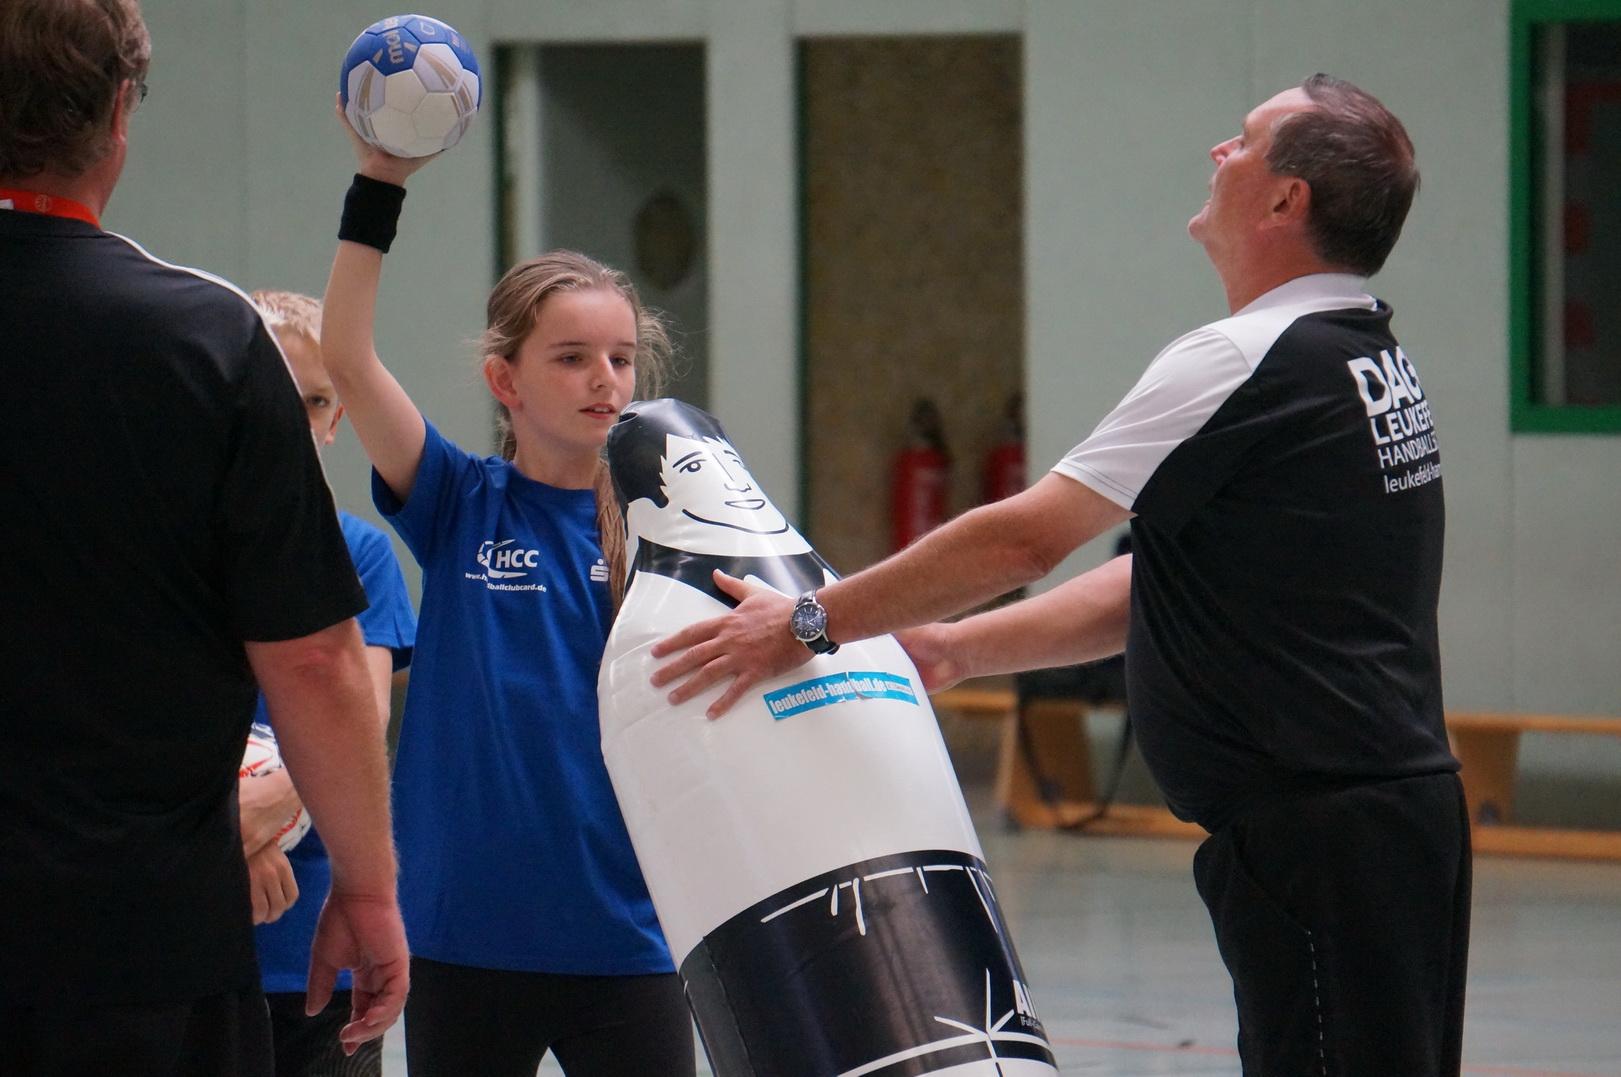 201808_Handballcamp_SDH_MG_209w